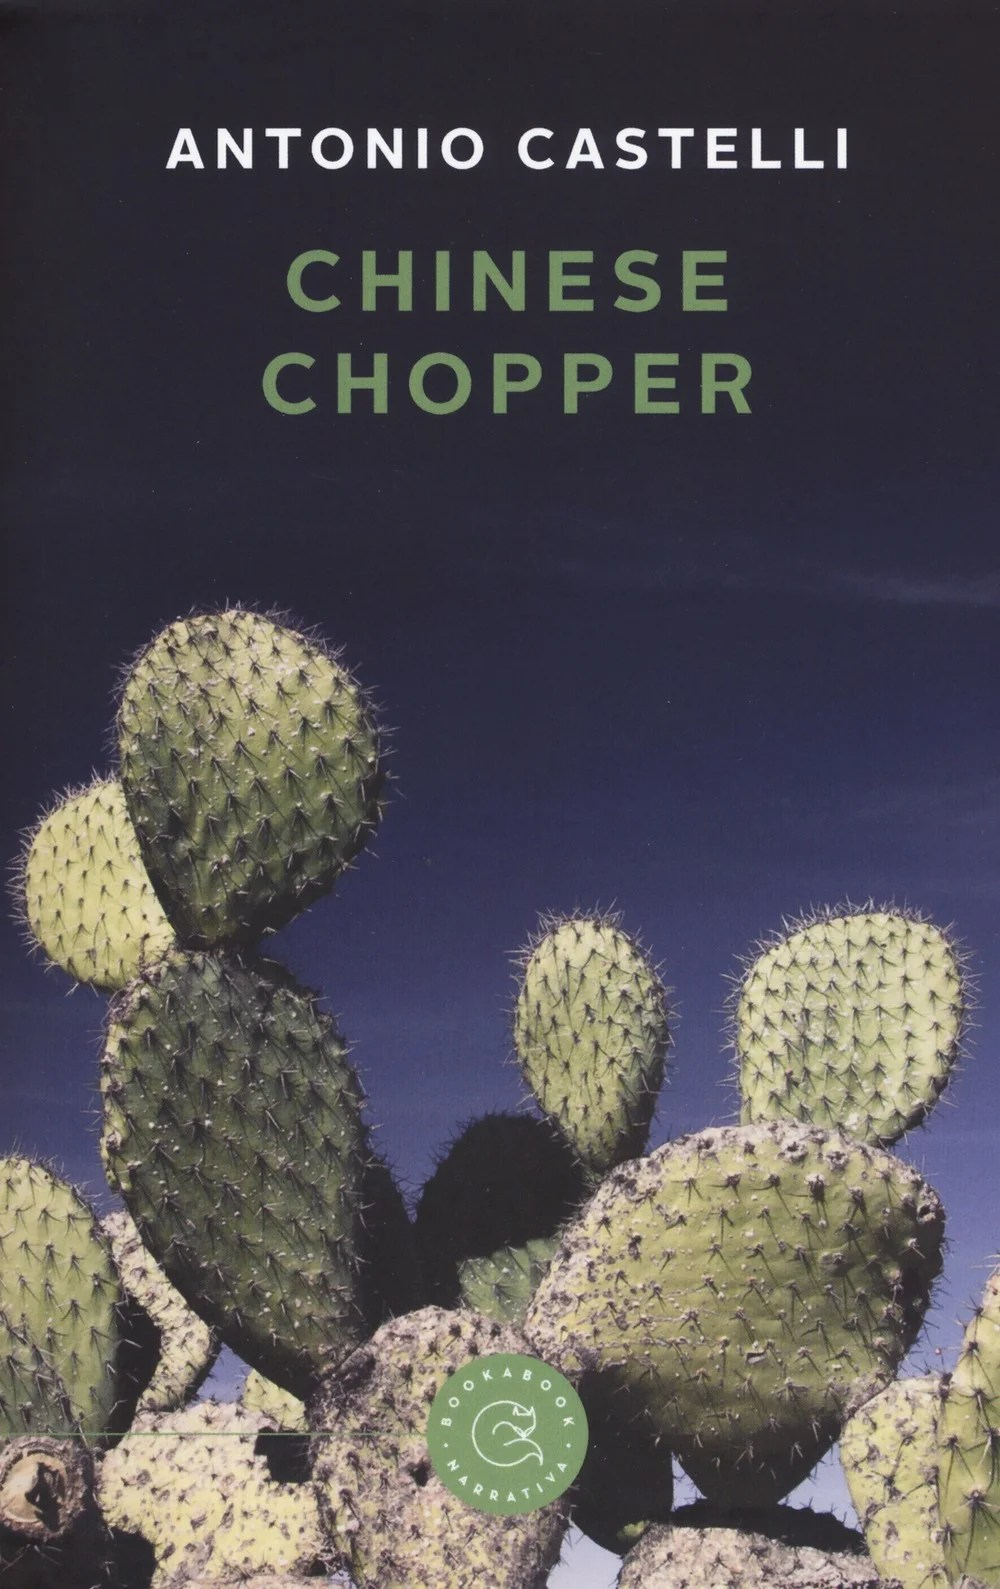 Recensione di Chinese Chopper – Antonio Castelli